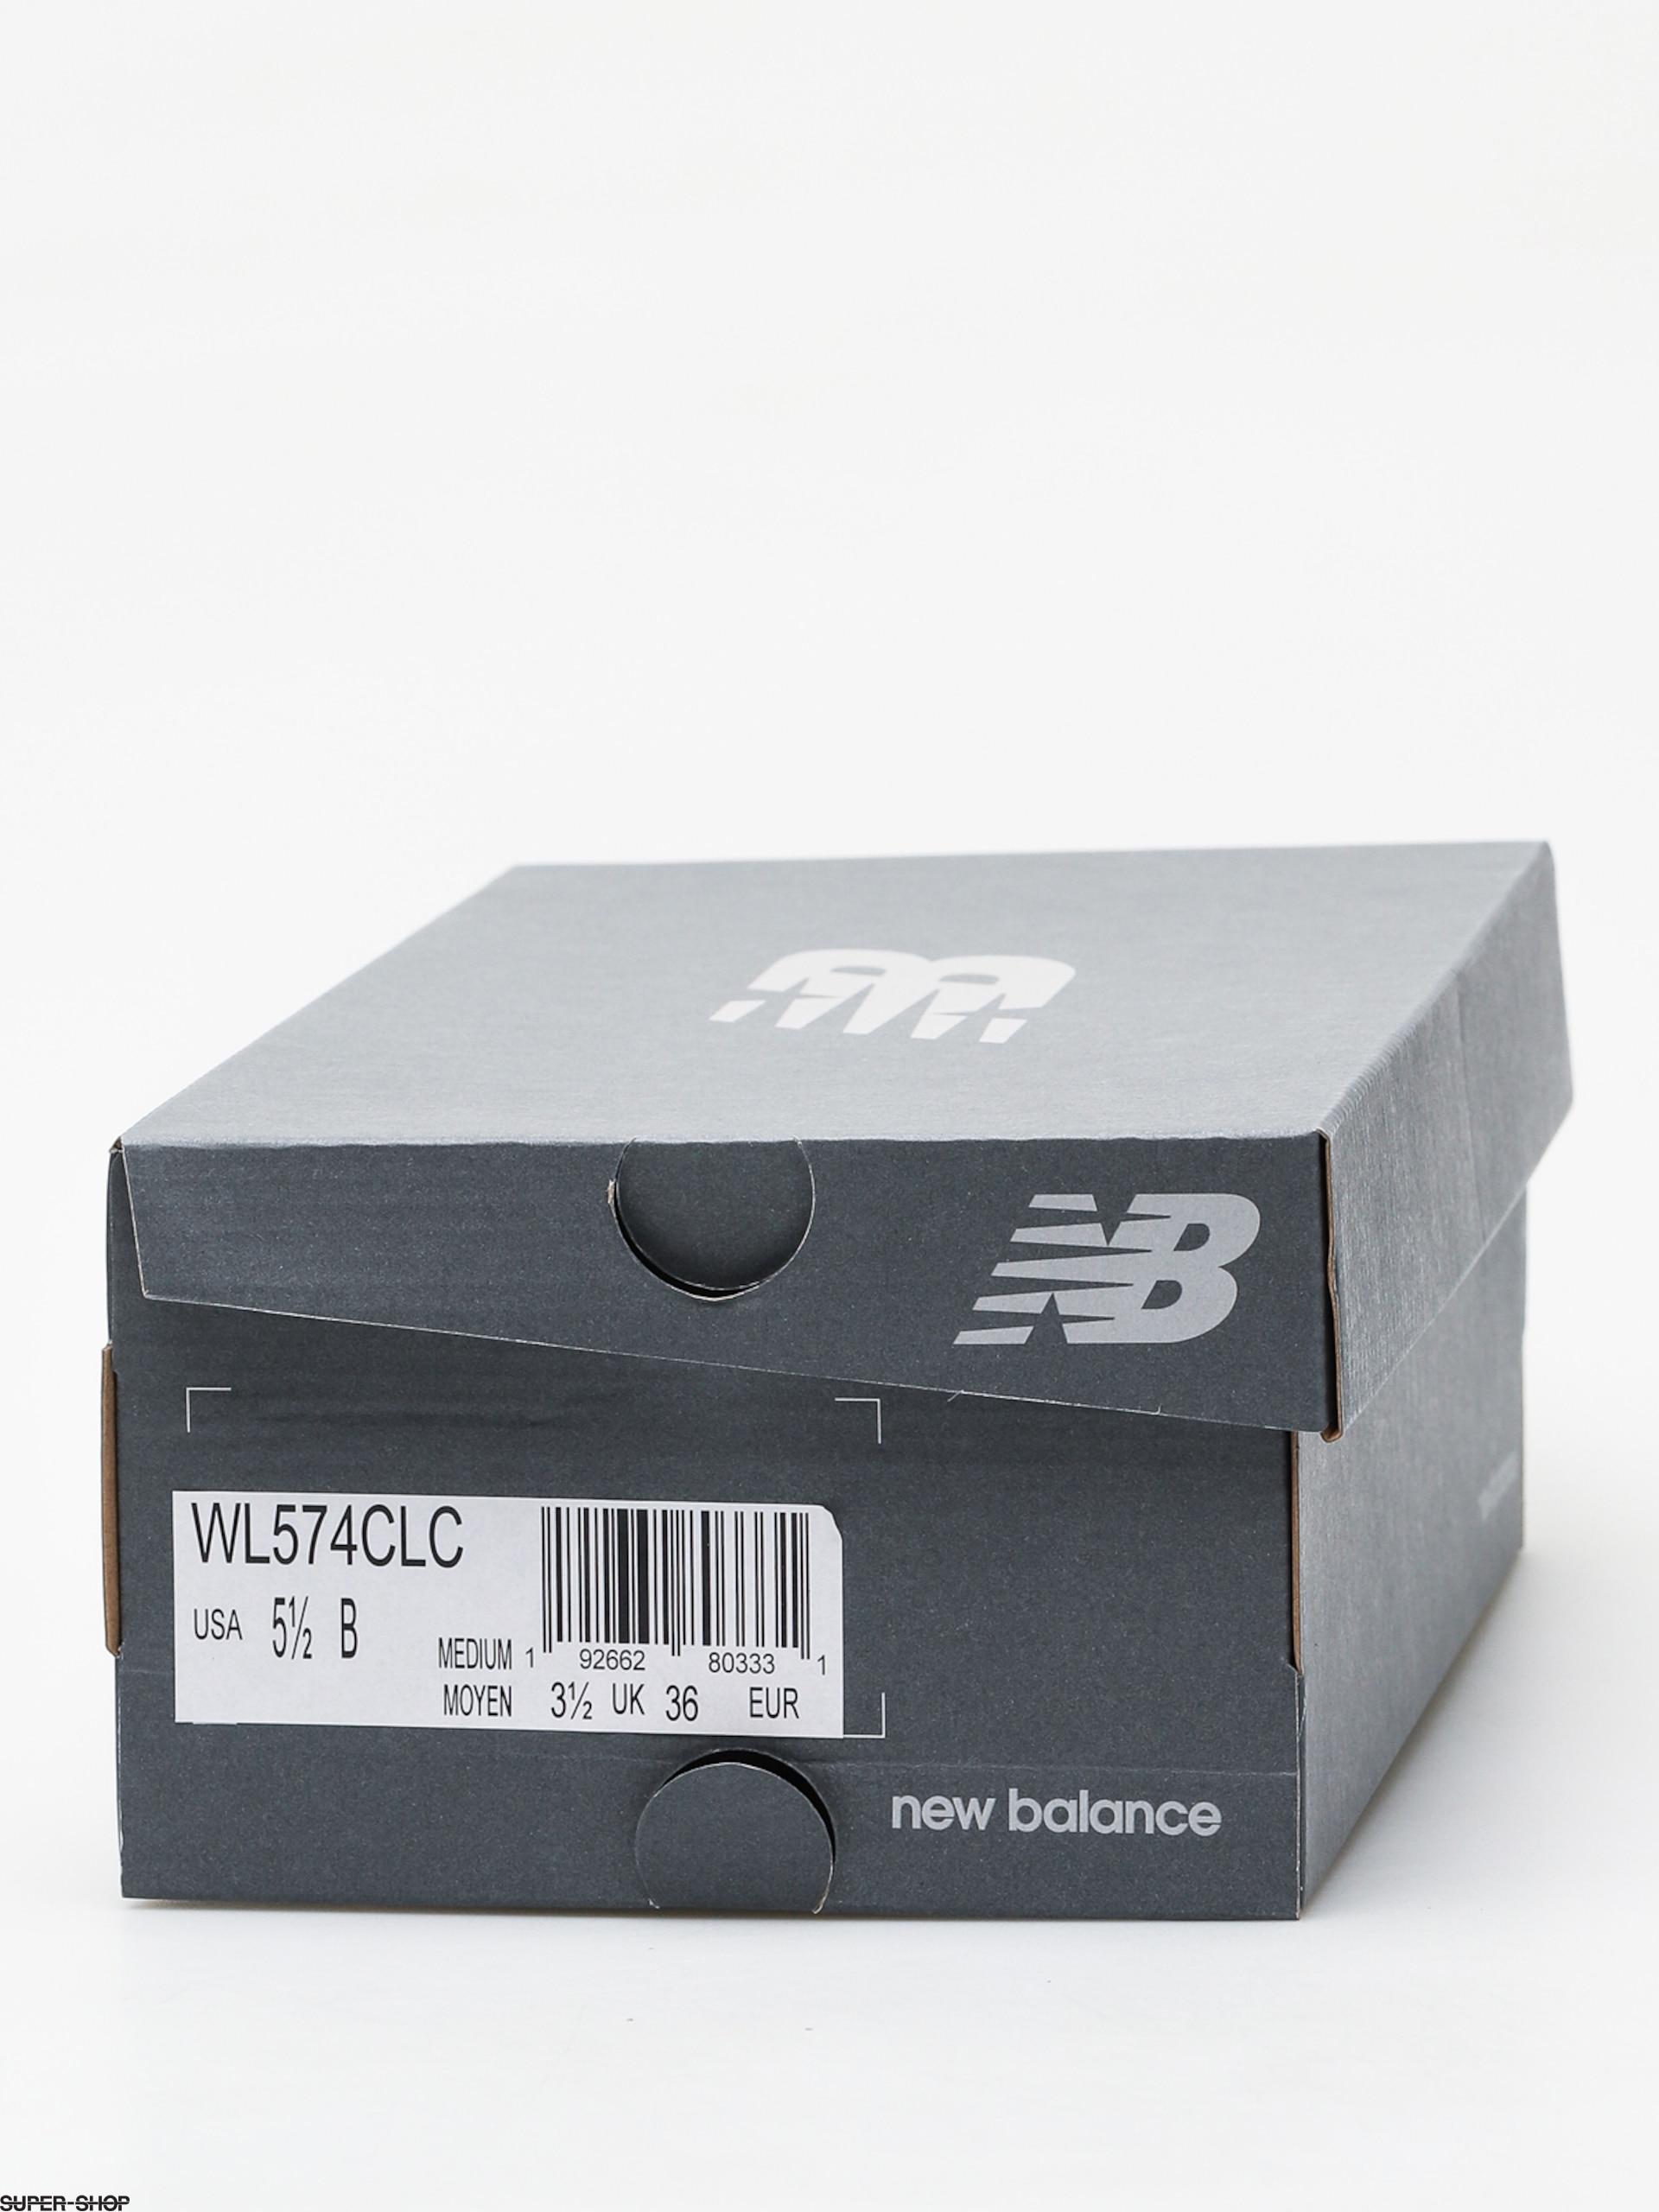 wl574clc new balance